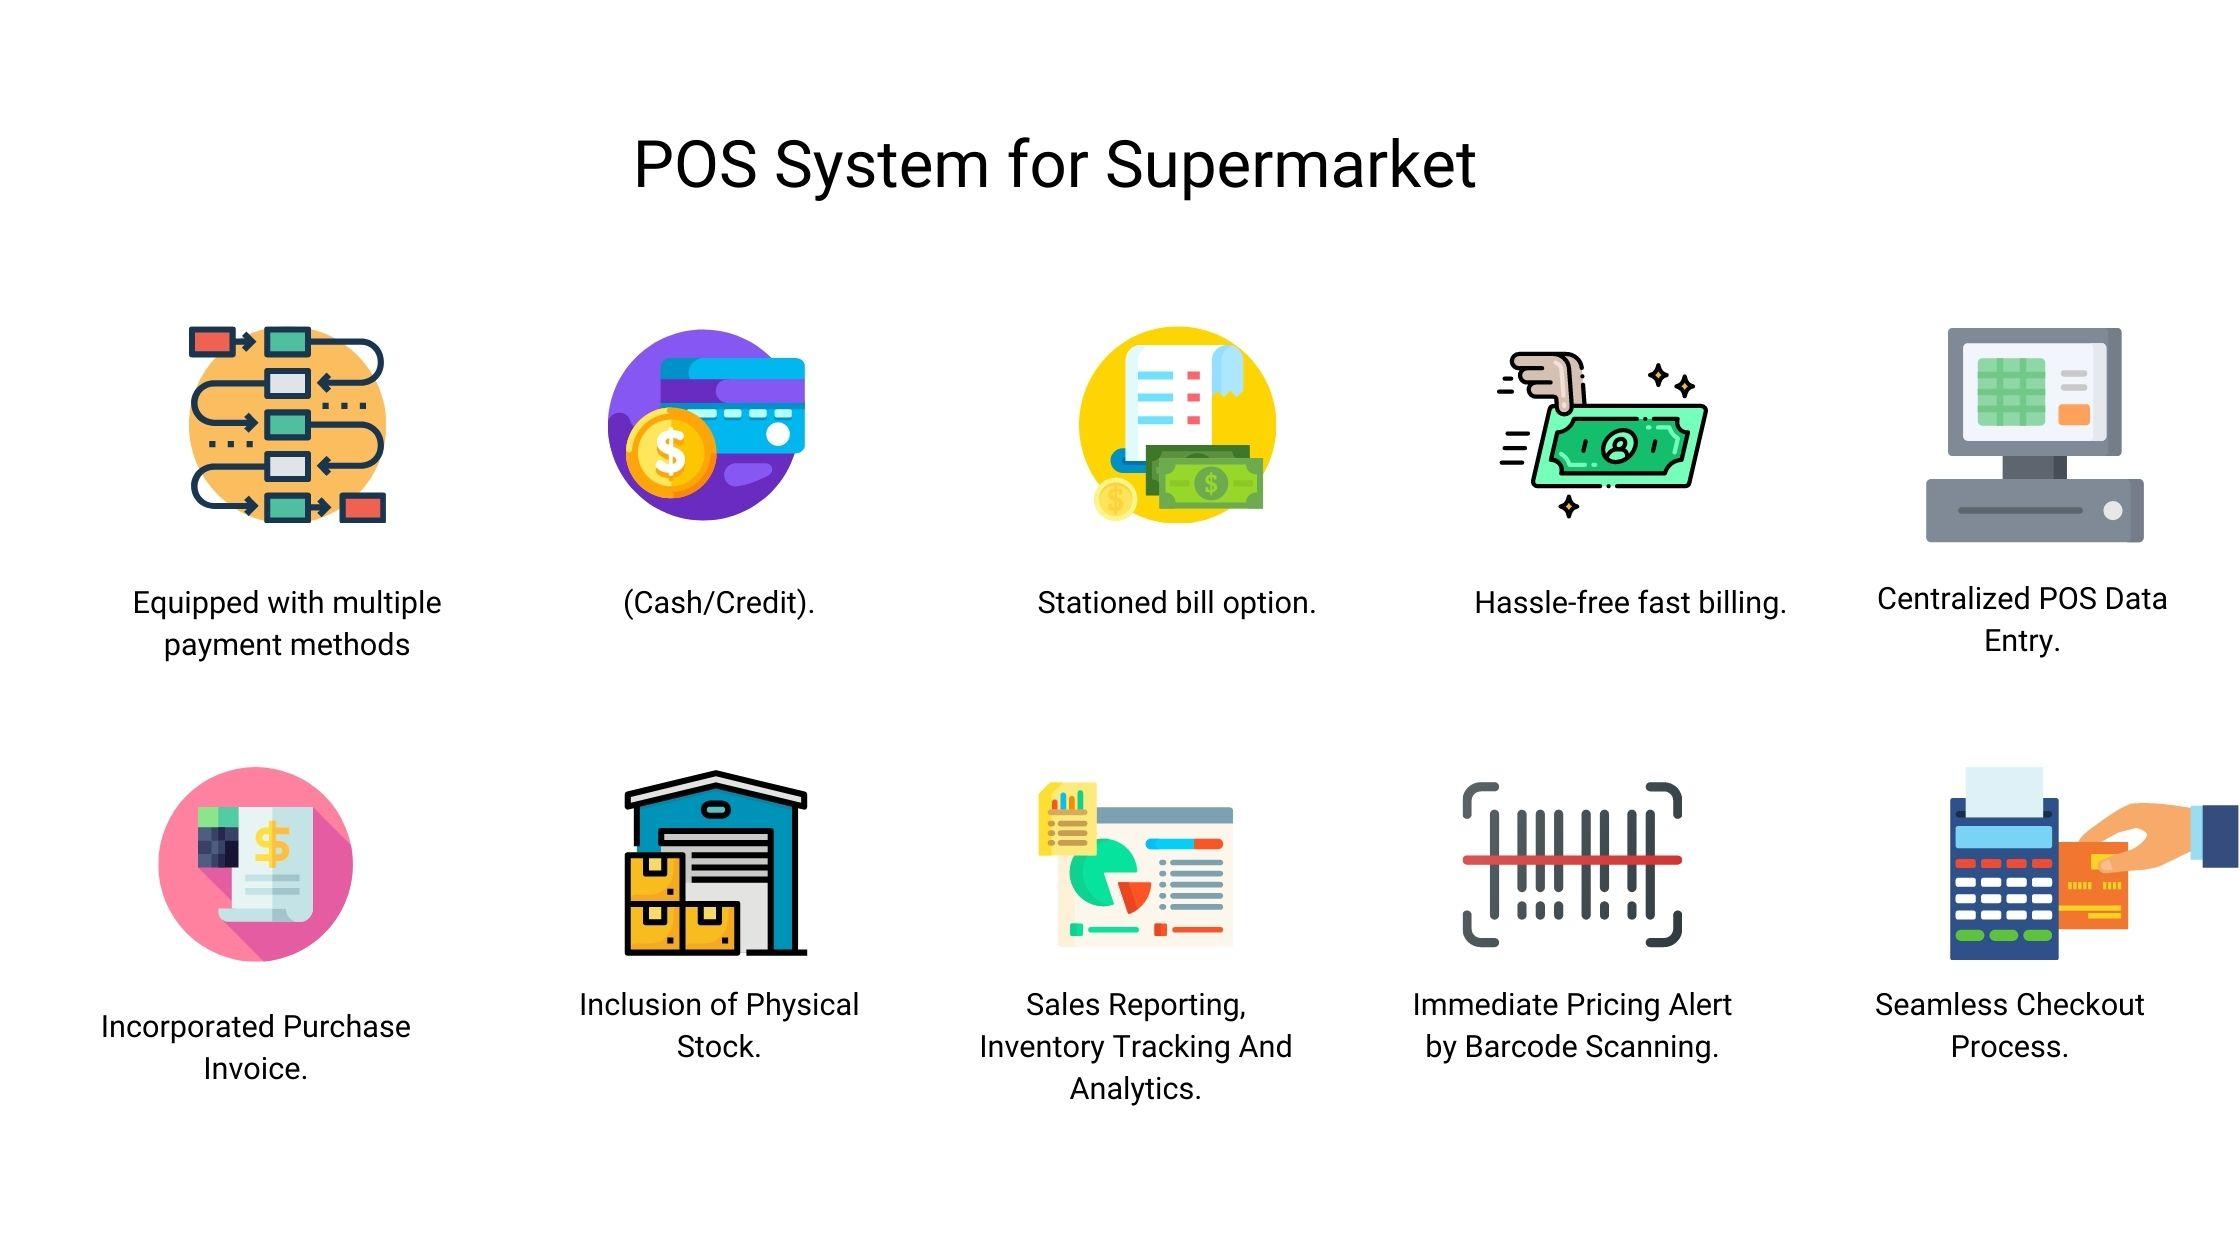 POS System for Supermarket